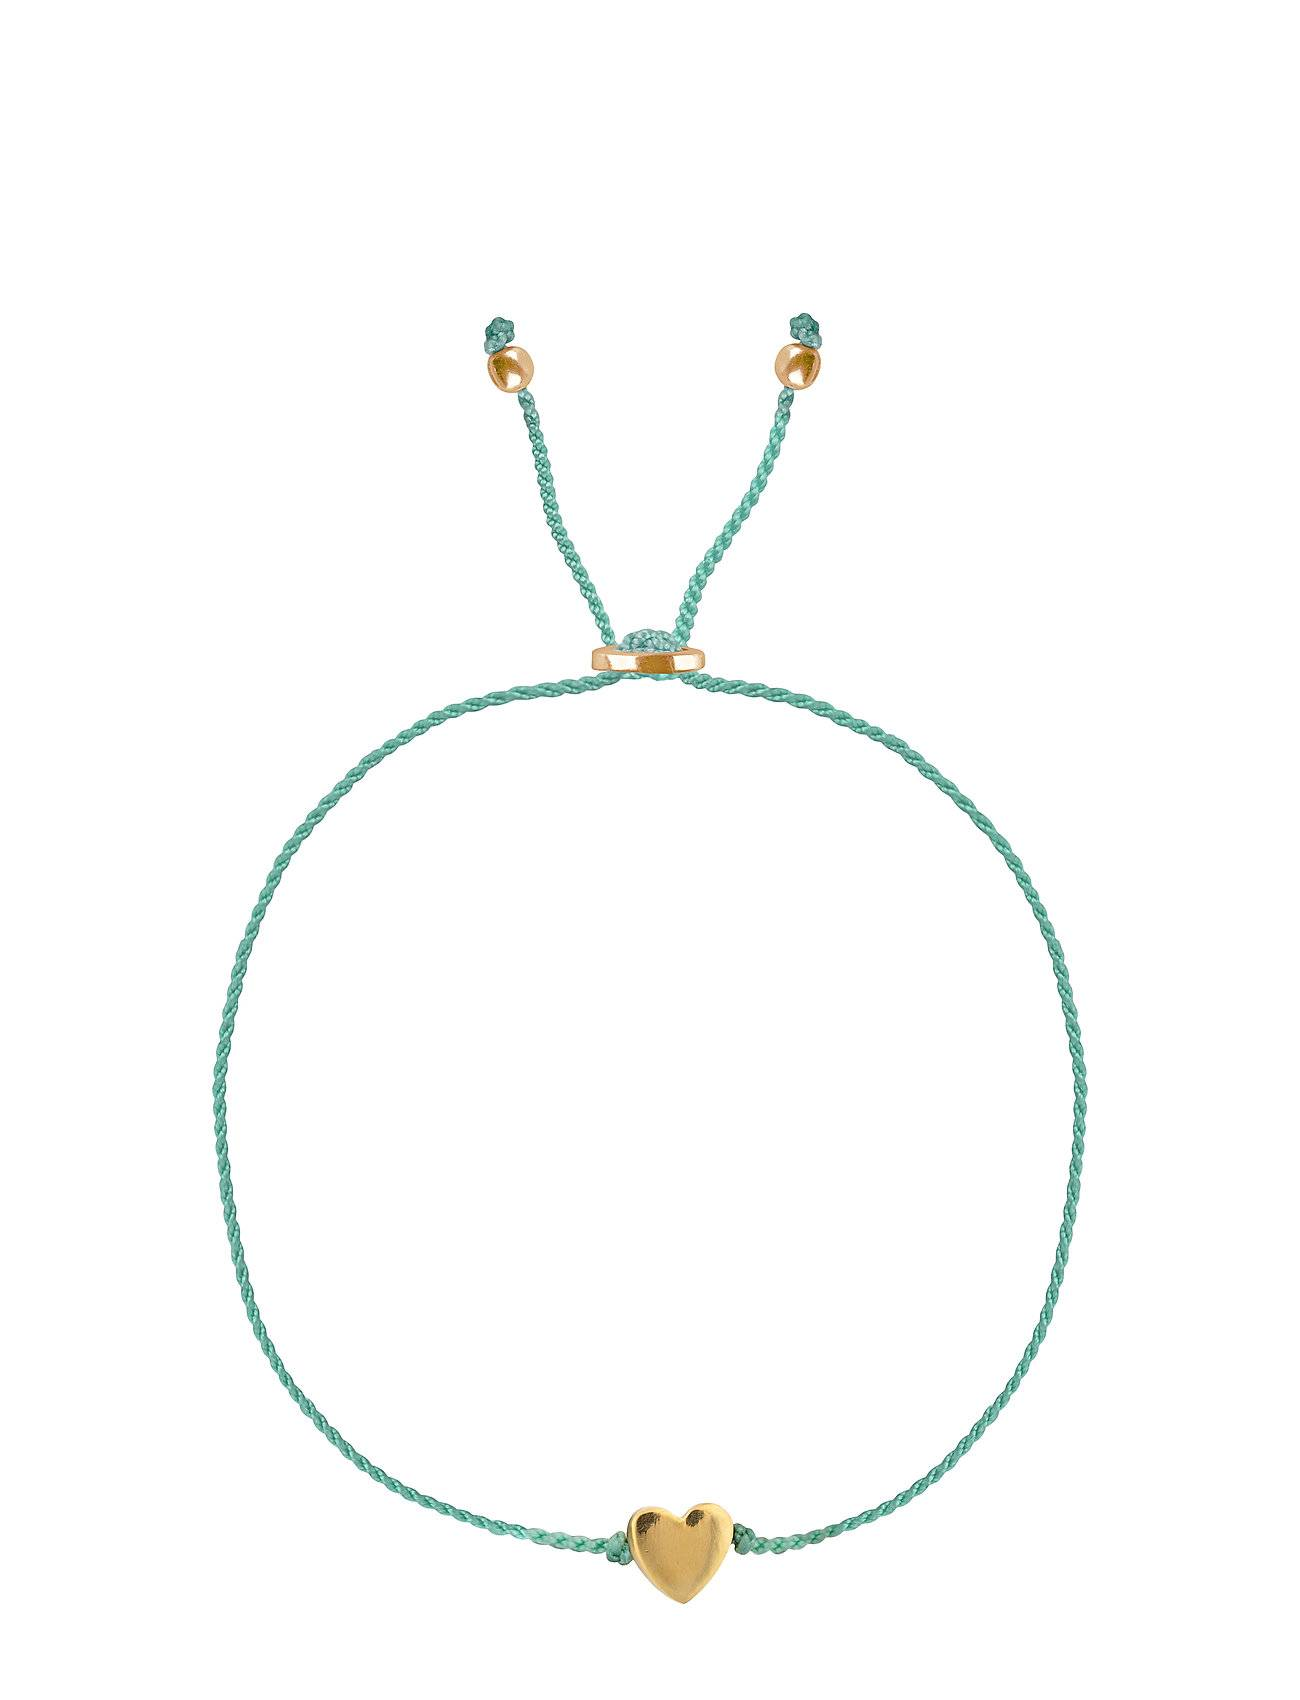 Syster P Sparkle Bracelet Heart Gold Aqua Accessories Jewellery Bracelets Chain Bracelets Sininen Syster P